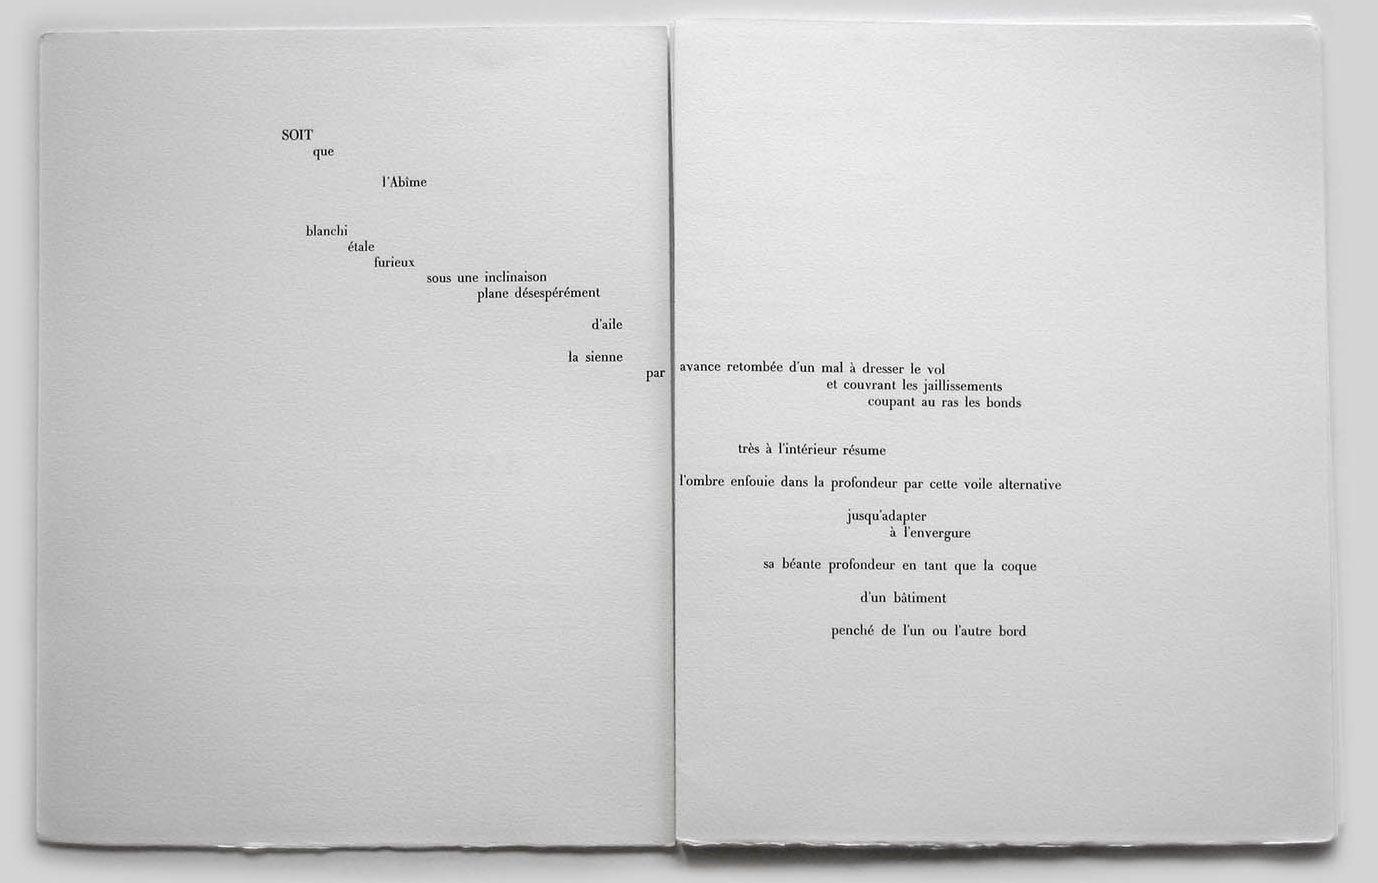 Seite Aus Un Coup De Dés Jamais N Abolira Le Hasard 1897 Von Stéphane Mallarmé Diagramação De Livros Poema Visual Livros De Poesia